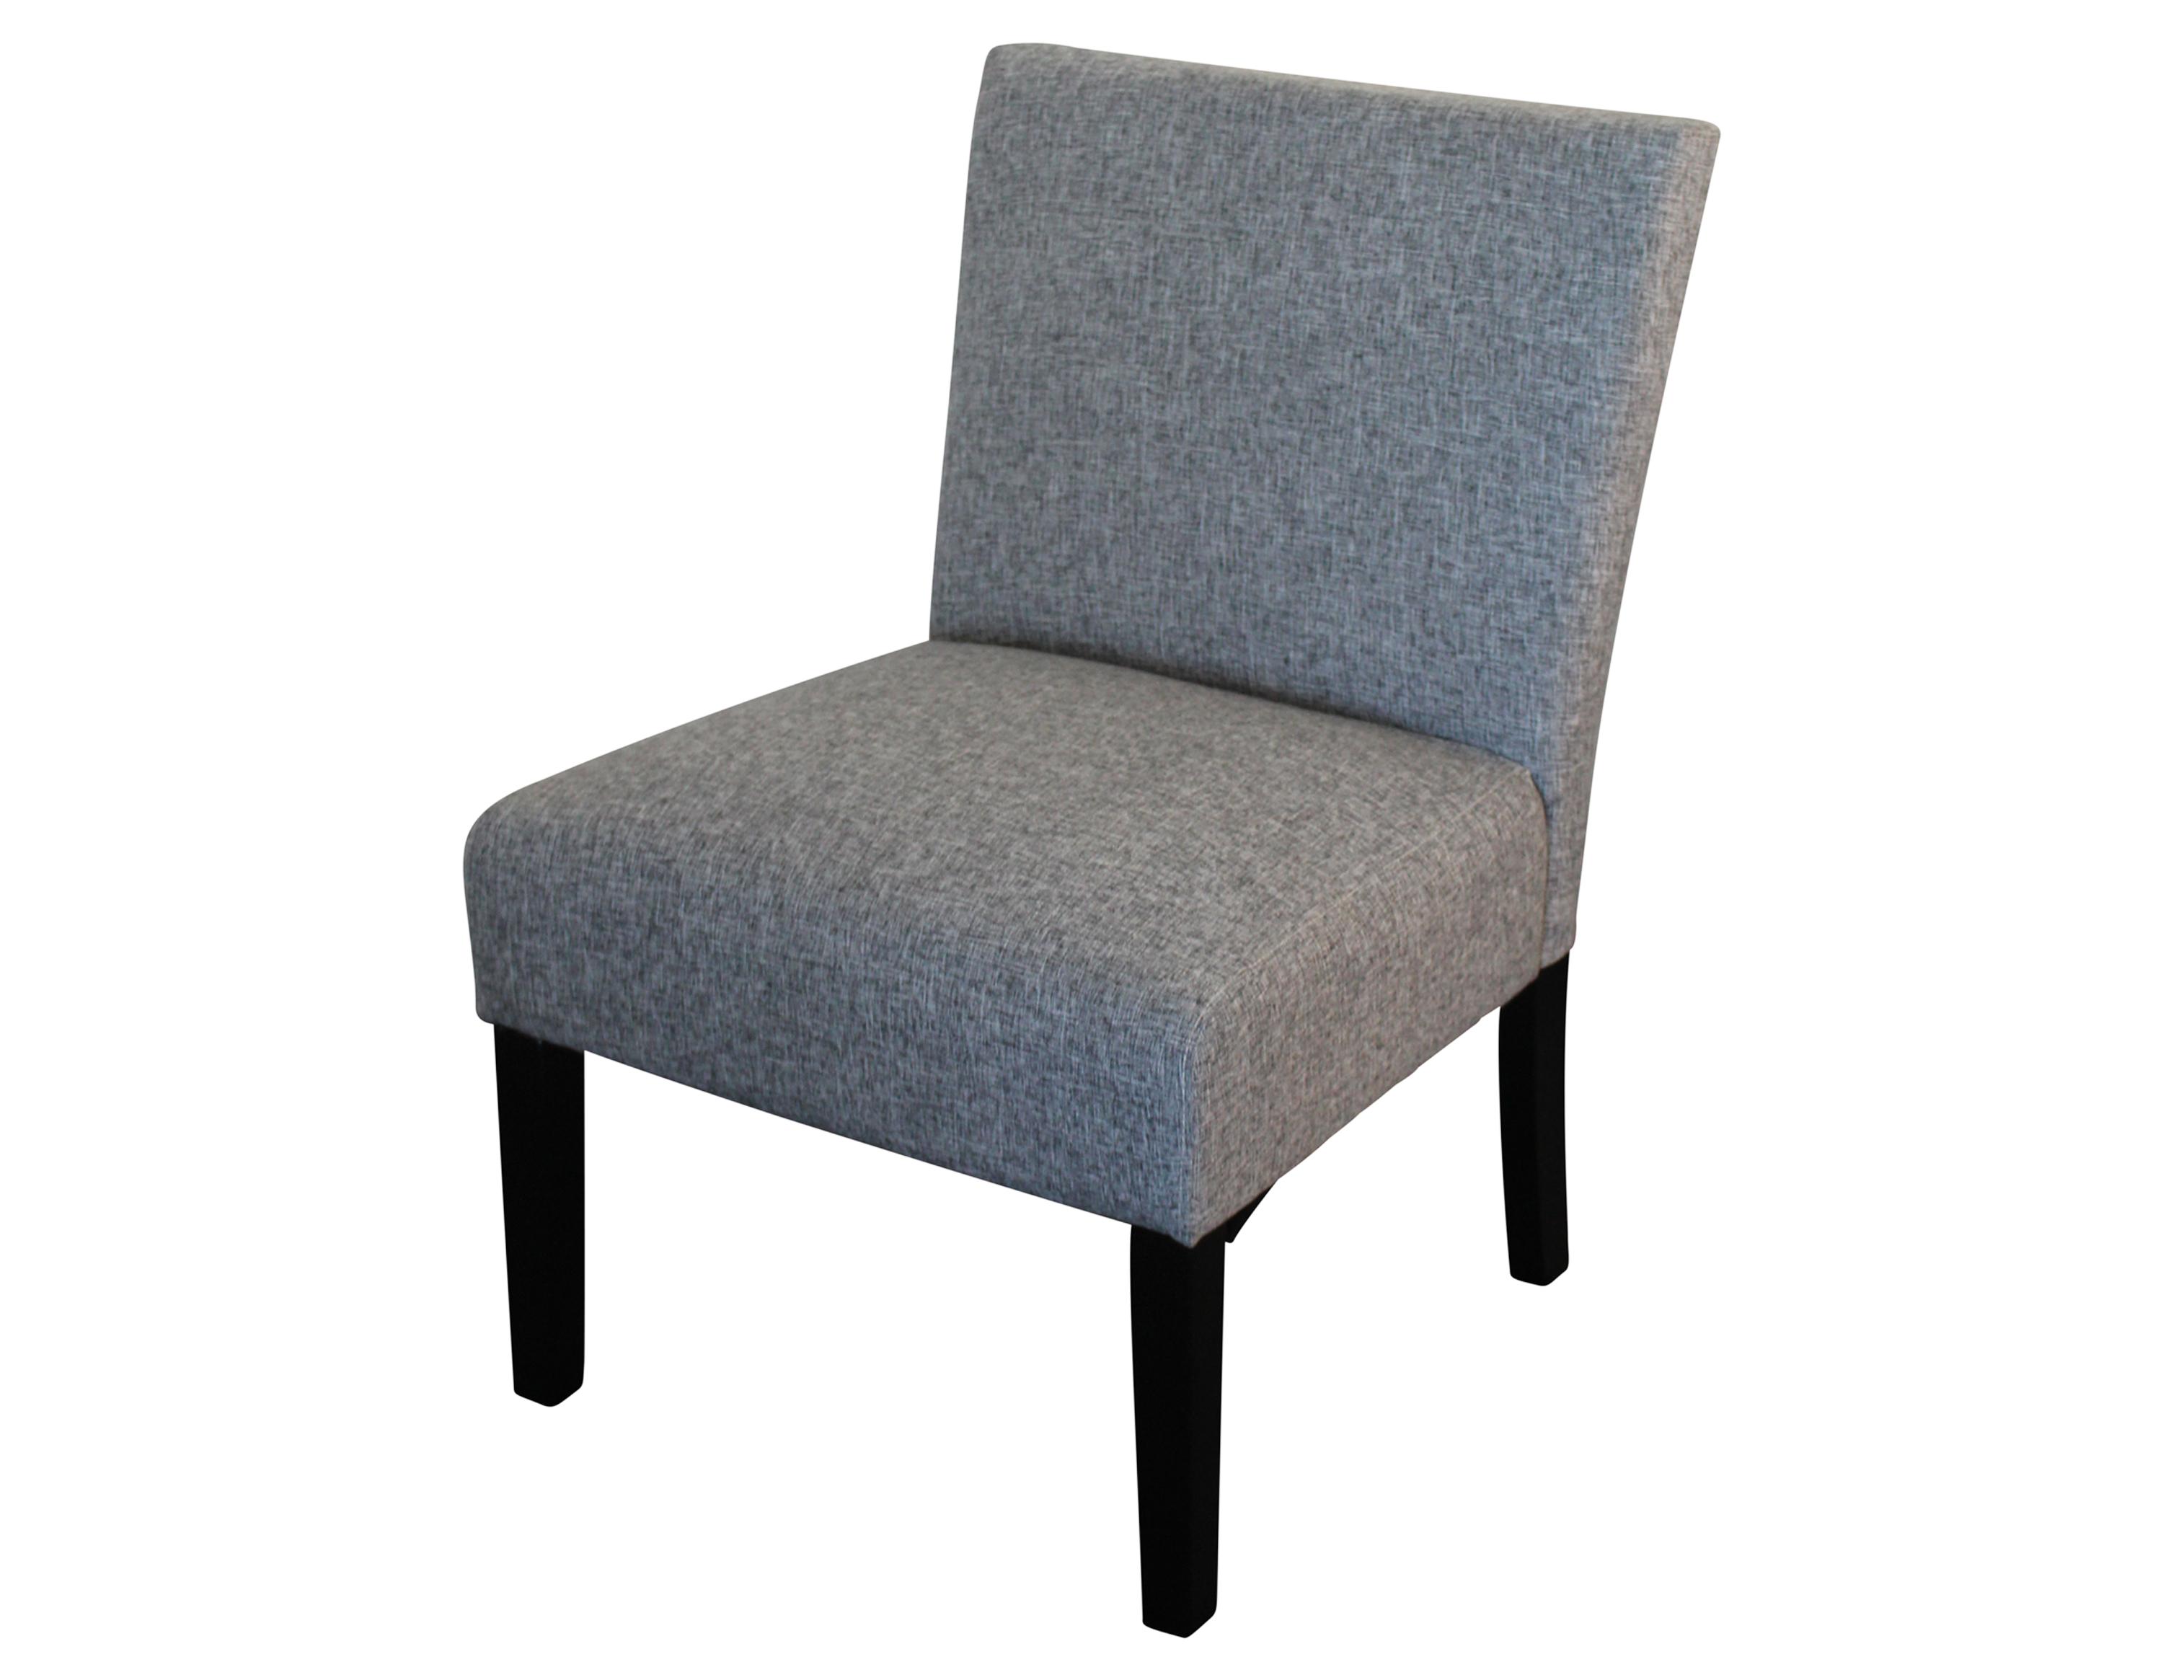 Albany Chair Dark Brown Leg Light Charcoal Fabric